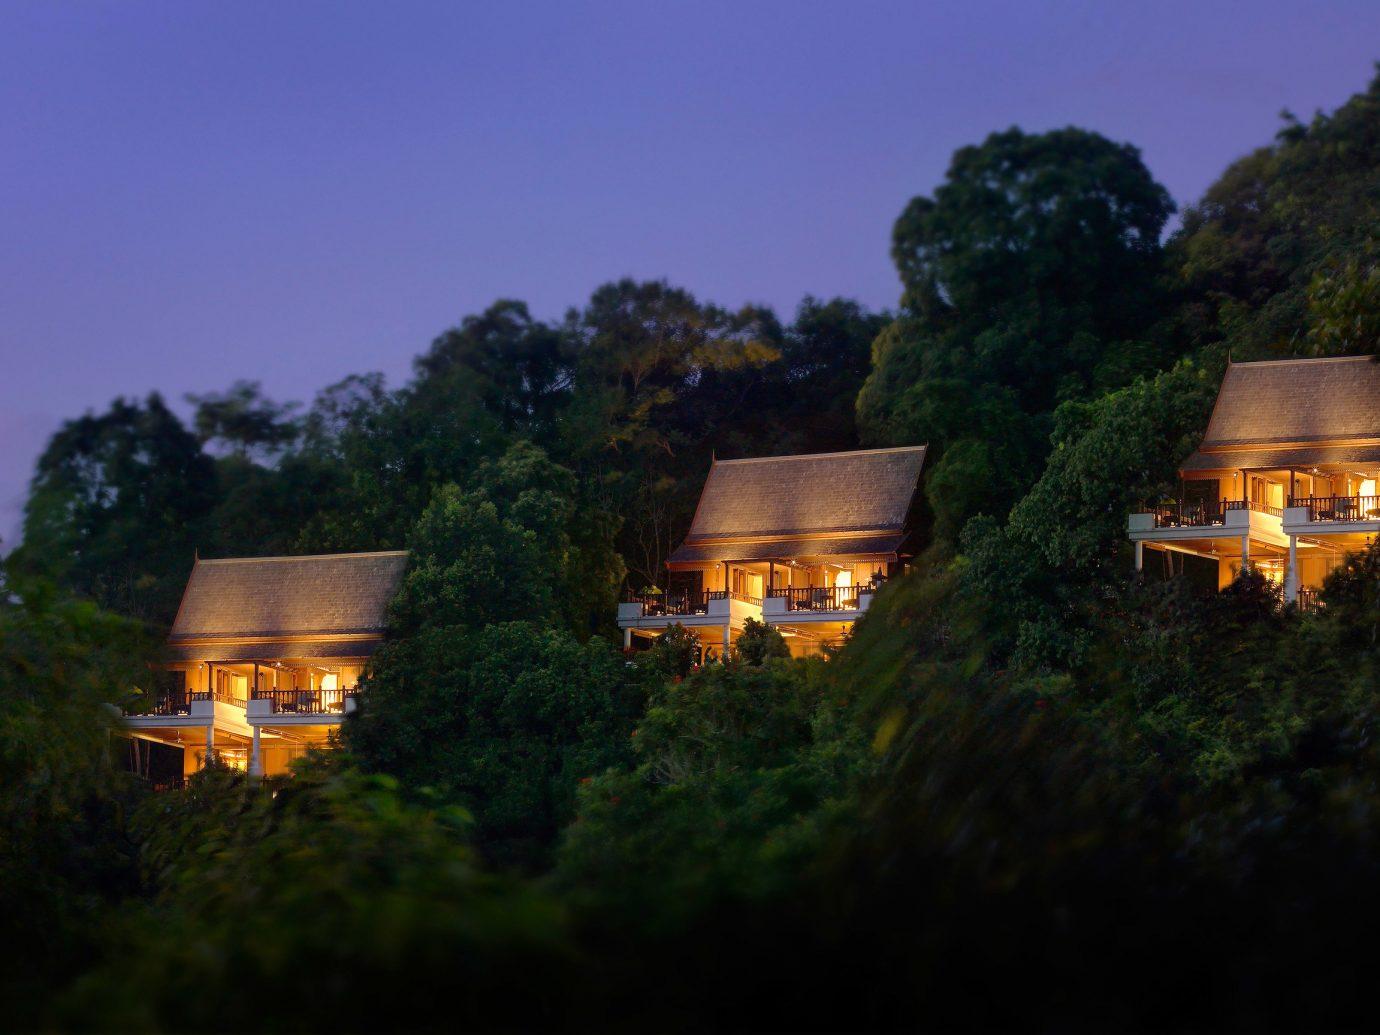 Night view at Pangkor Laut Resort, Pangkor, Malaysia